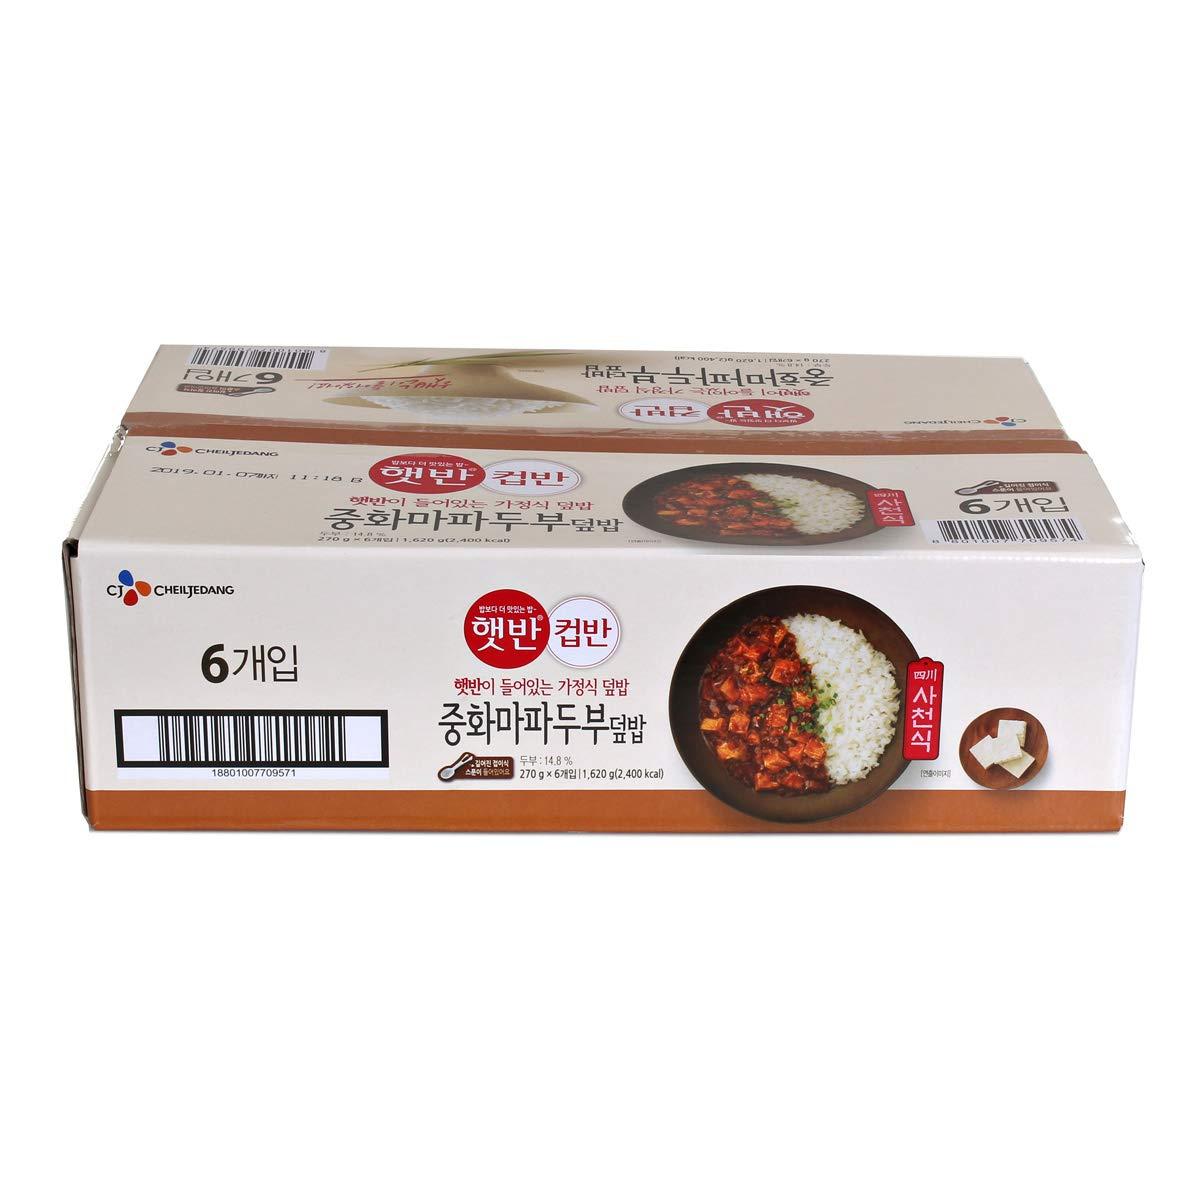 CJ Cupbahn Cooked Mapa Tofu Rice bibimbap, Gluten-Free, Vegan, Microwaveable, 9.5-oz (Pack of 6) by CJ